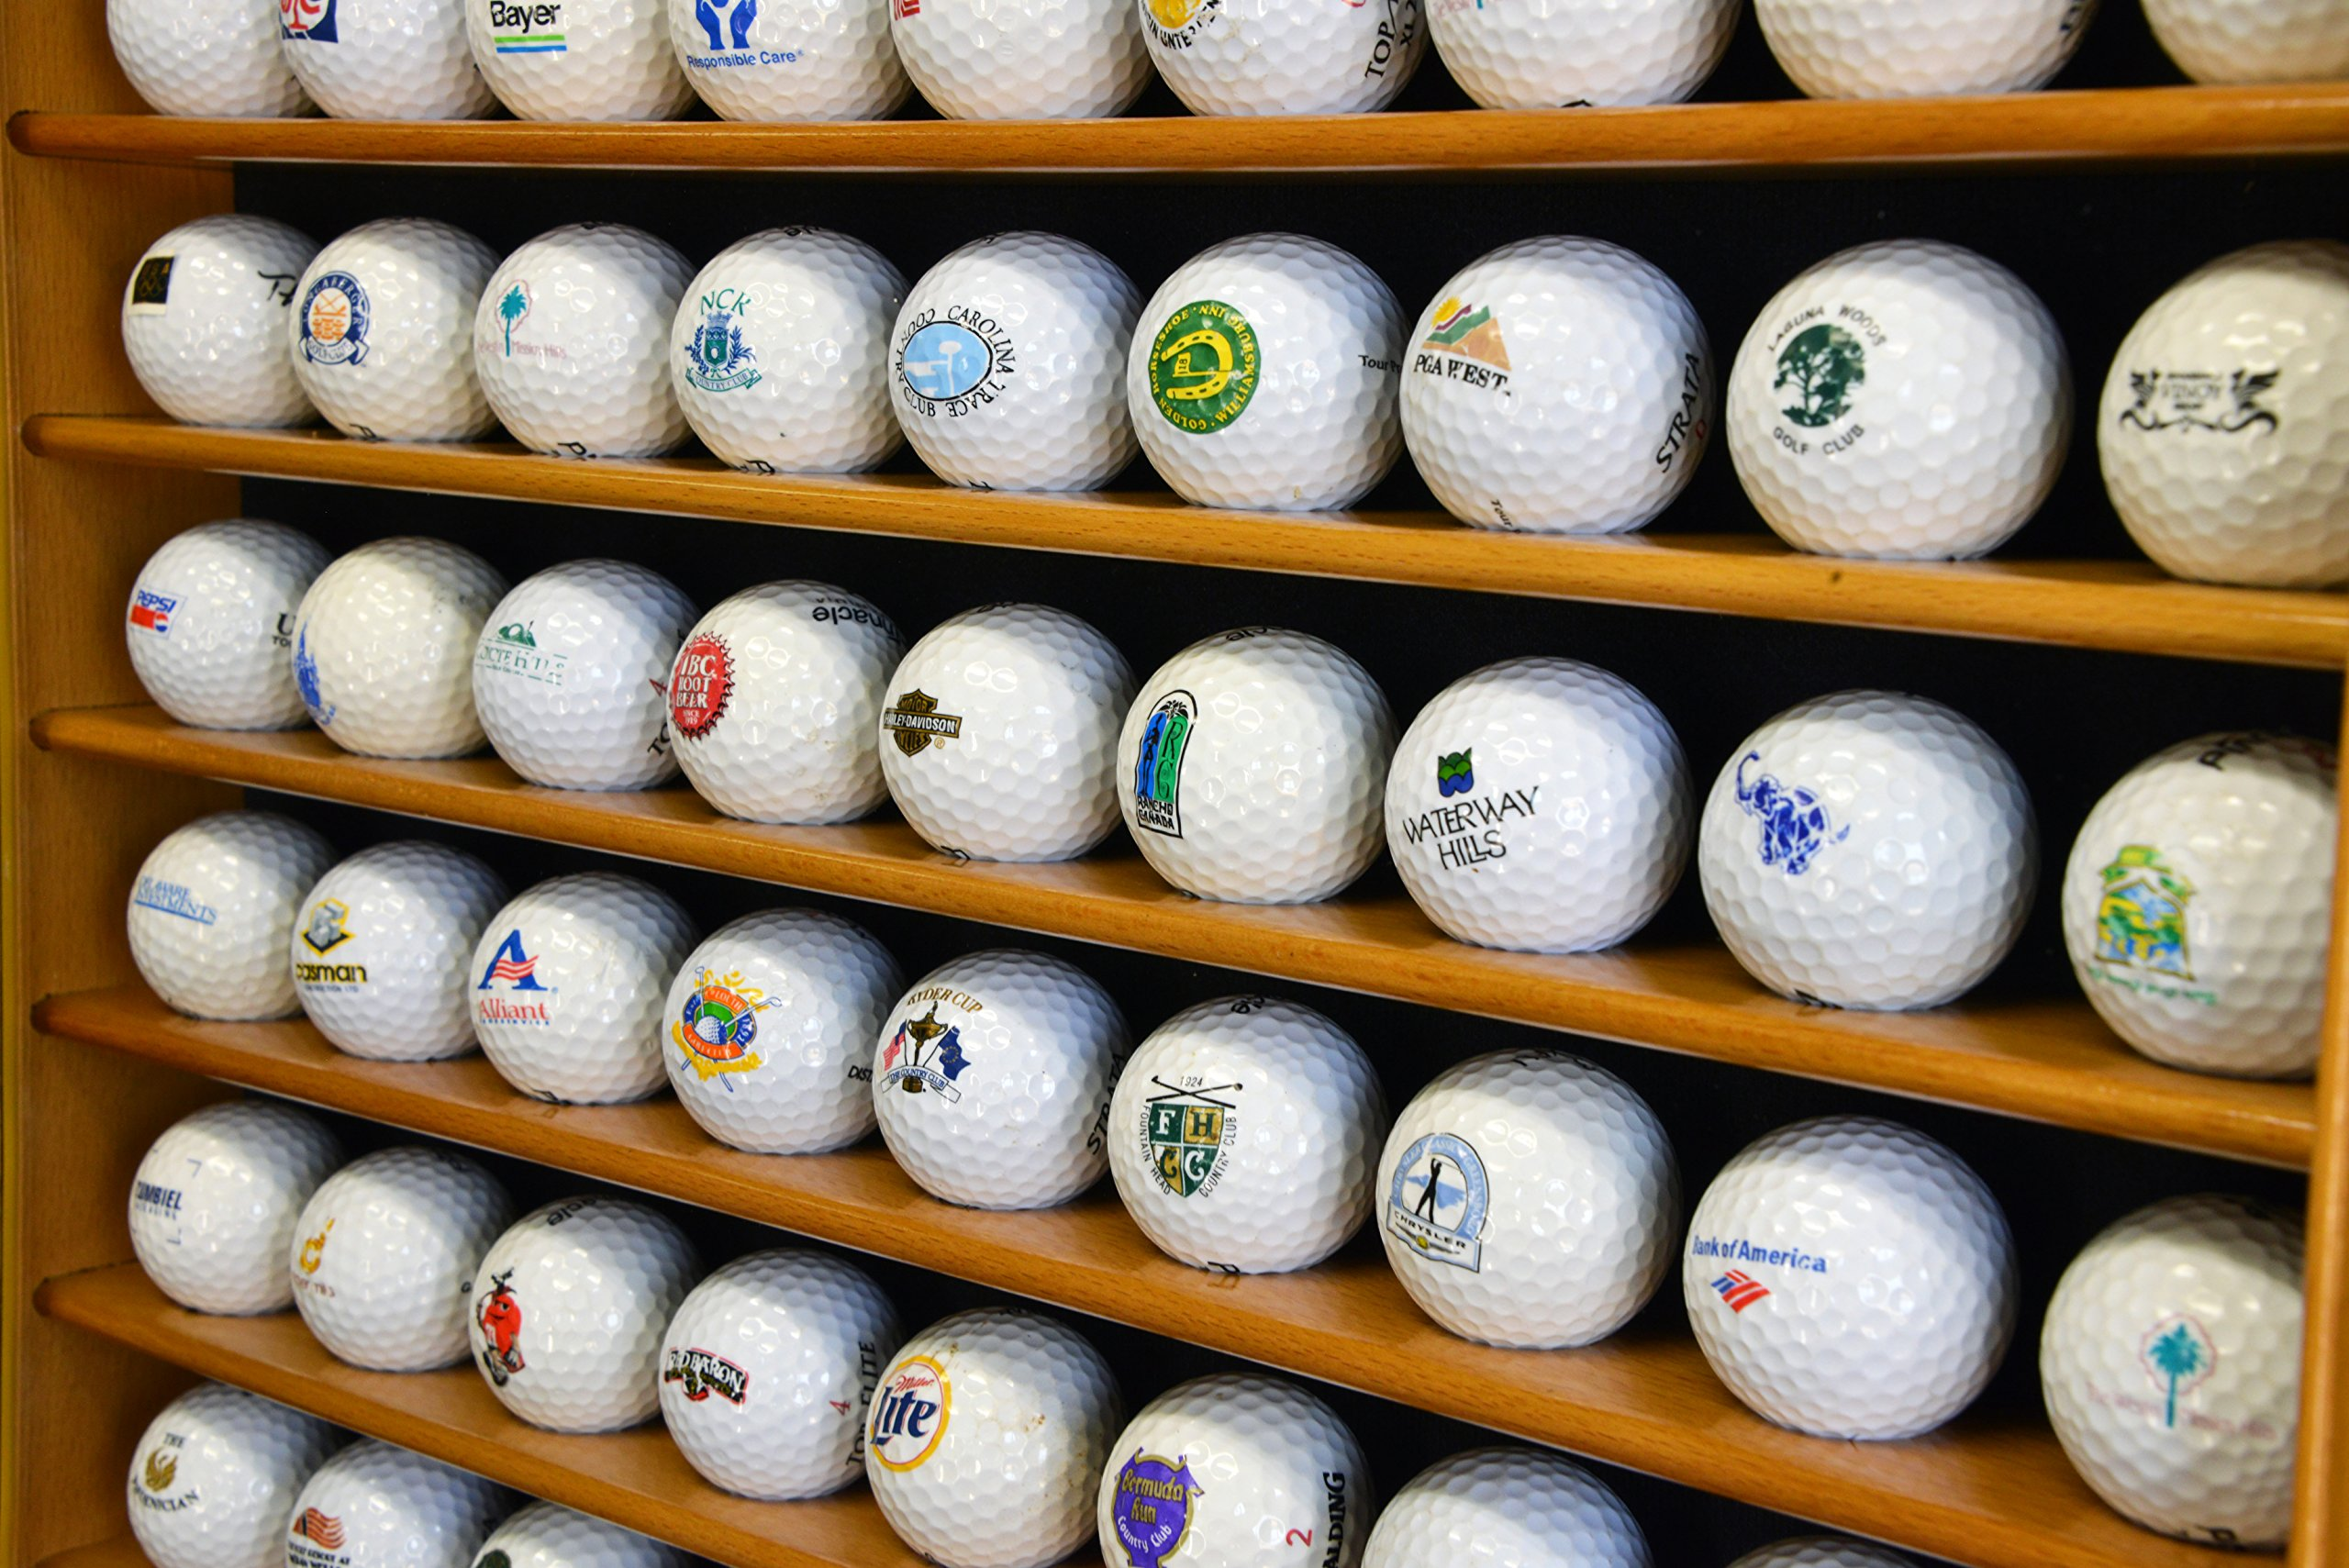 70 Golf Ball Display Case Cabinet Holder Wall Rack w/ UV Protection -Oak by sfDisplay (Image #4)